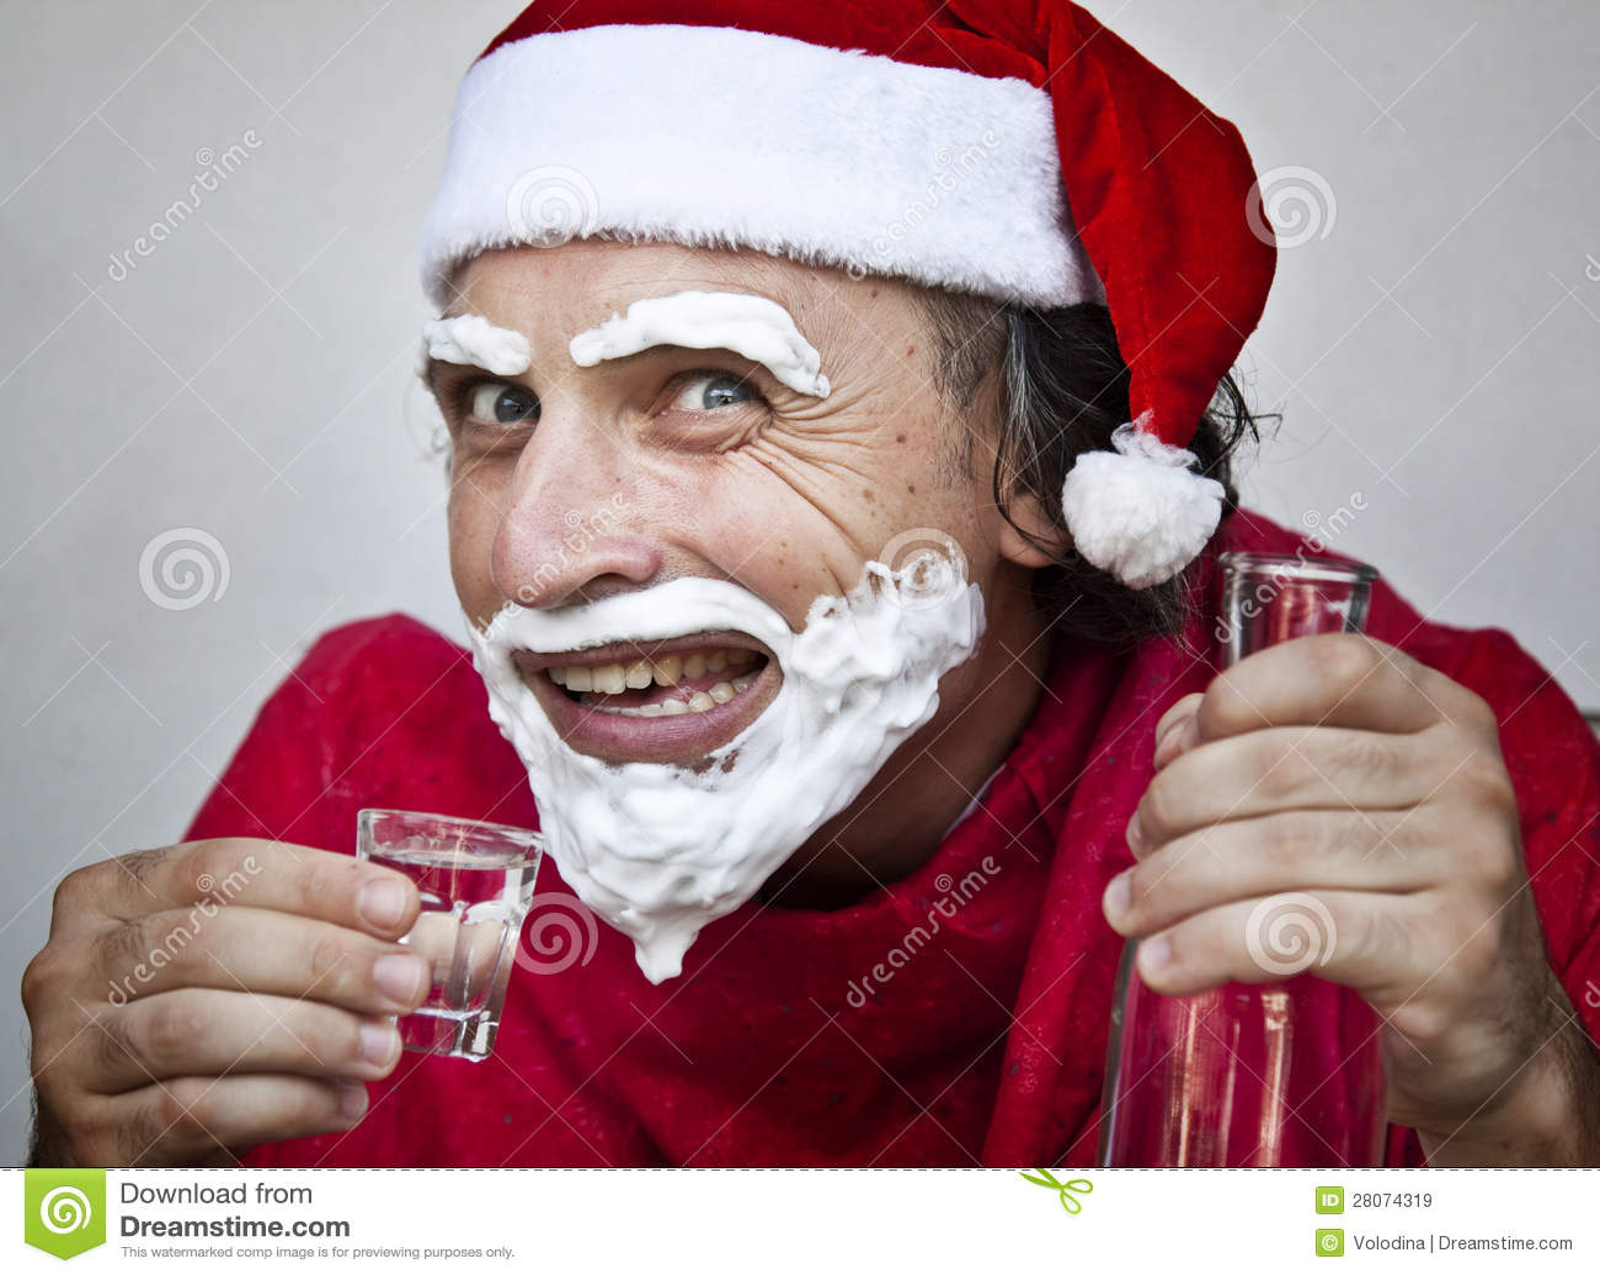 Very Bad Santa Claus Royalty Free Stock Images Image